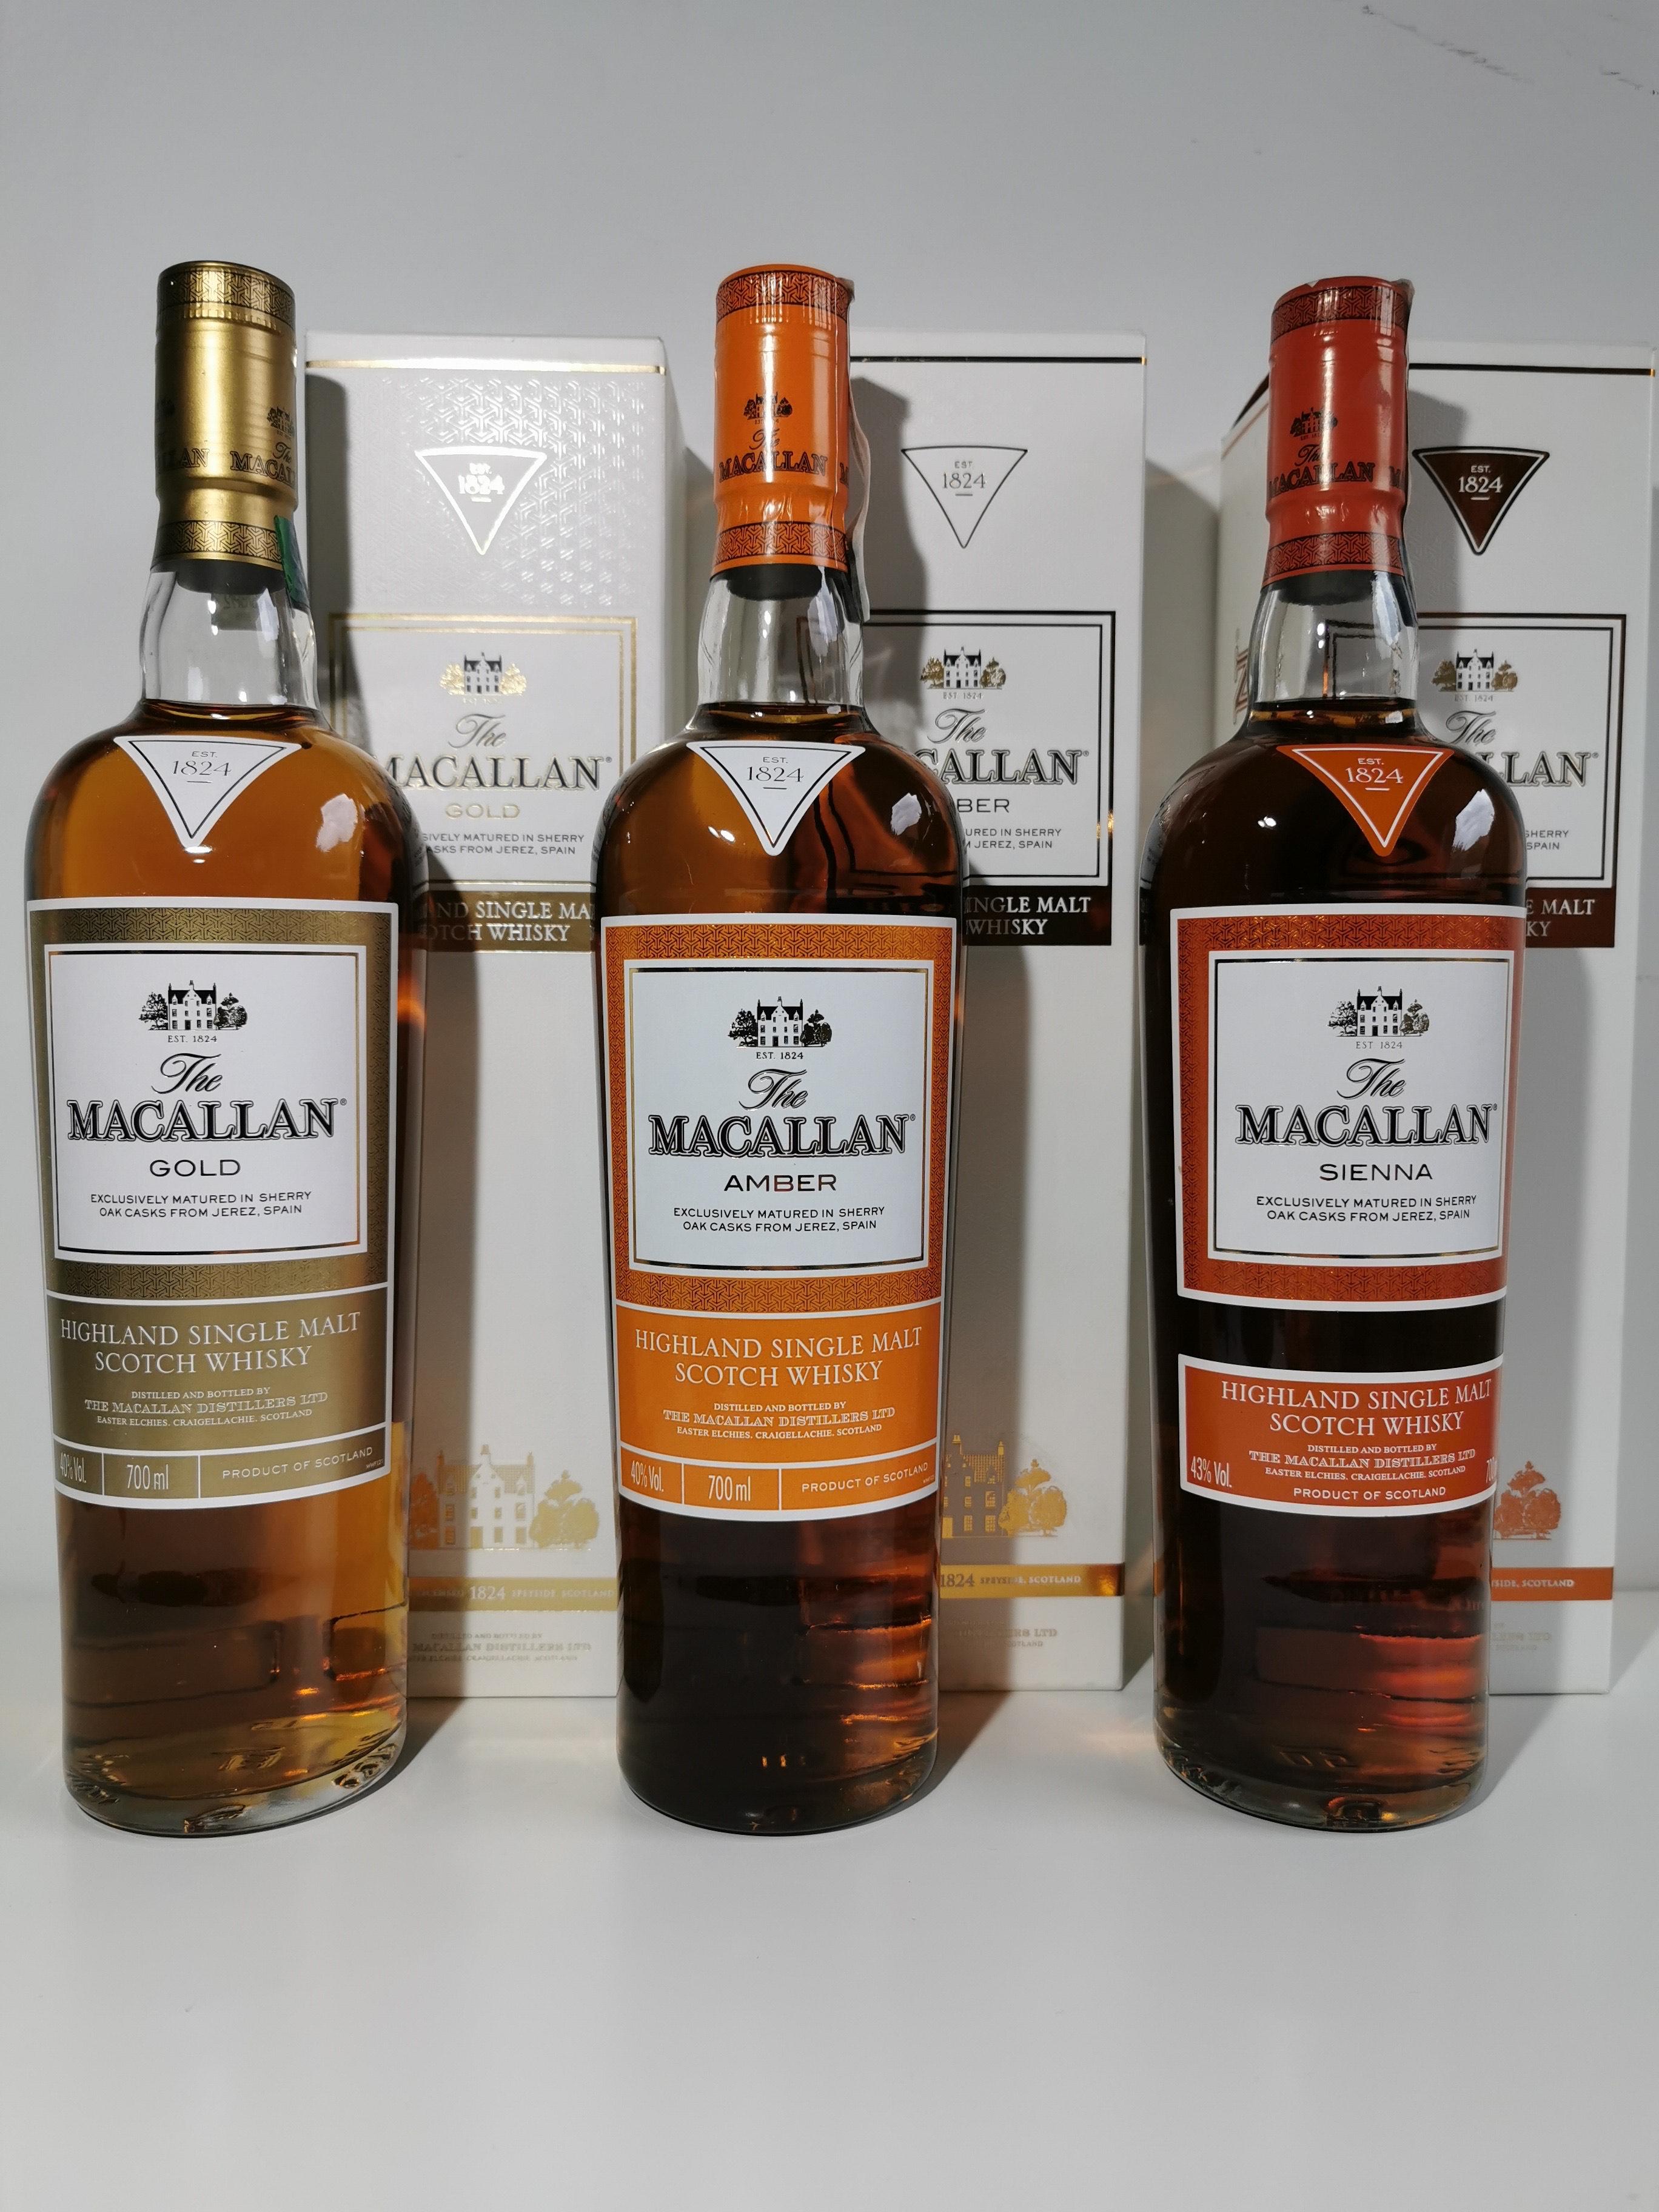 Kolekcja Whisky Macallan 1824 series (Gold | Amber | Sienna) + Macallan 12yo double cask